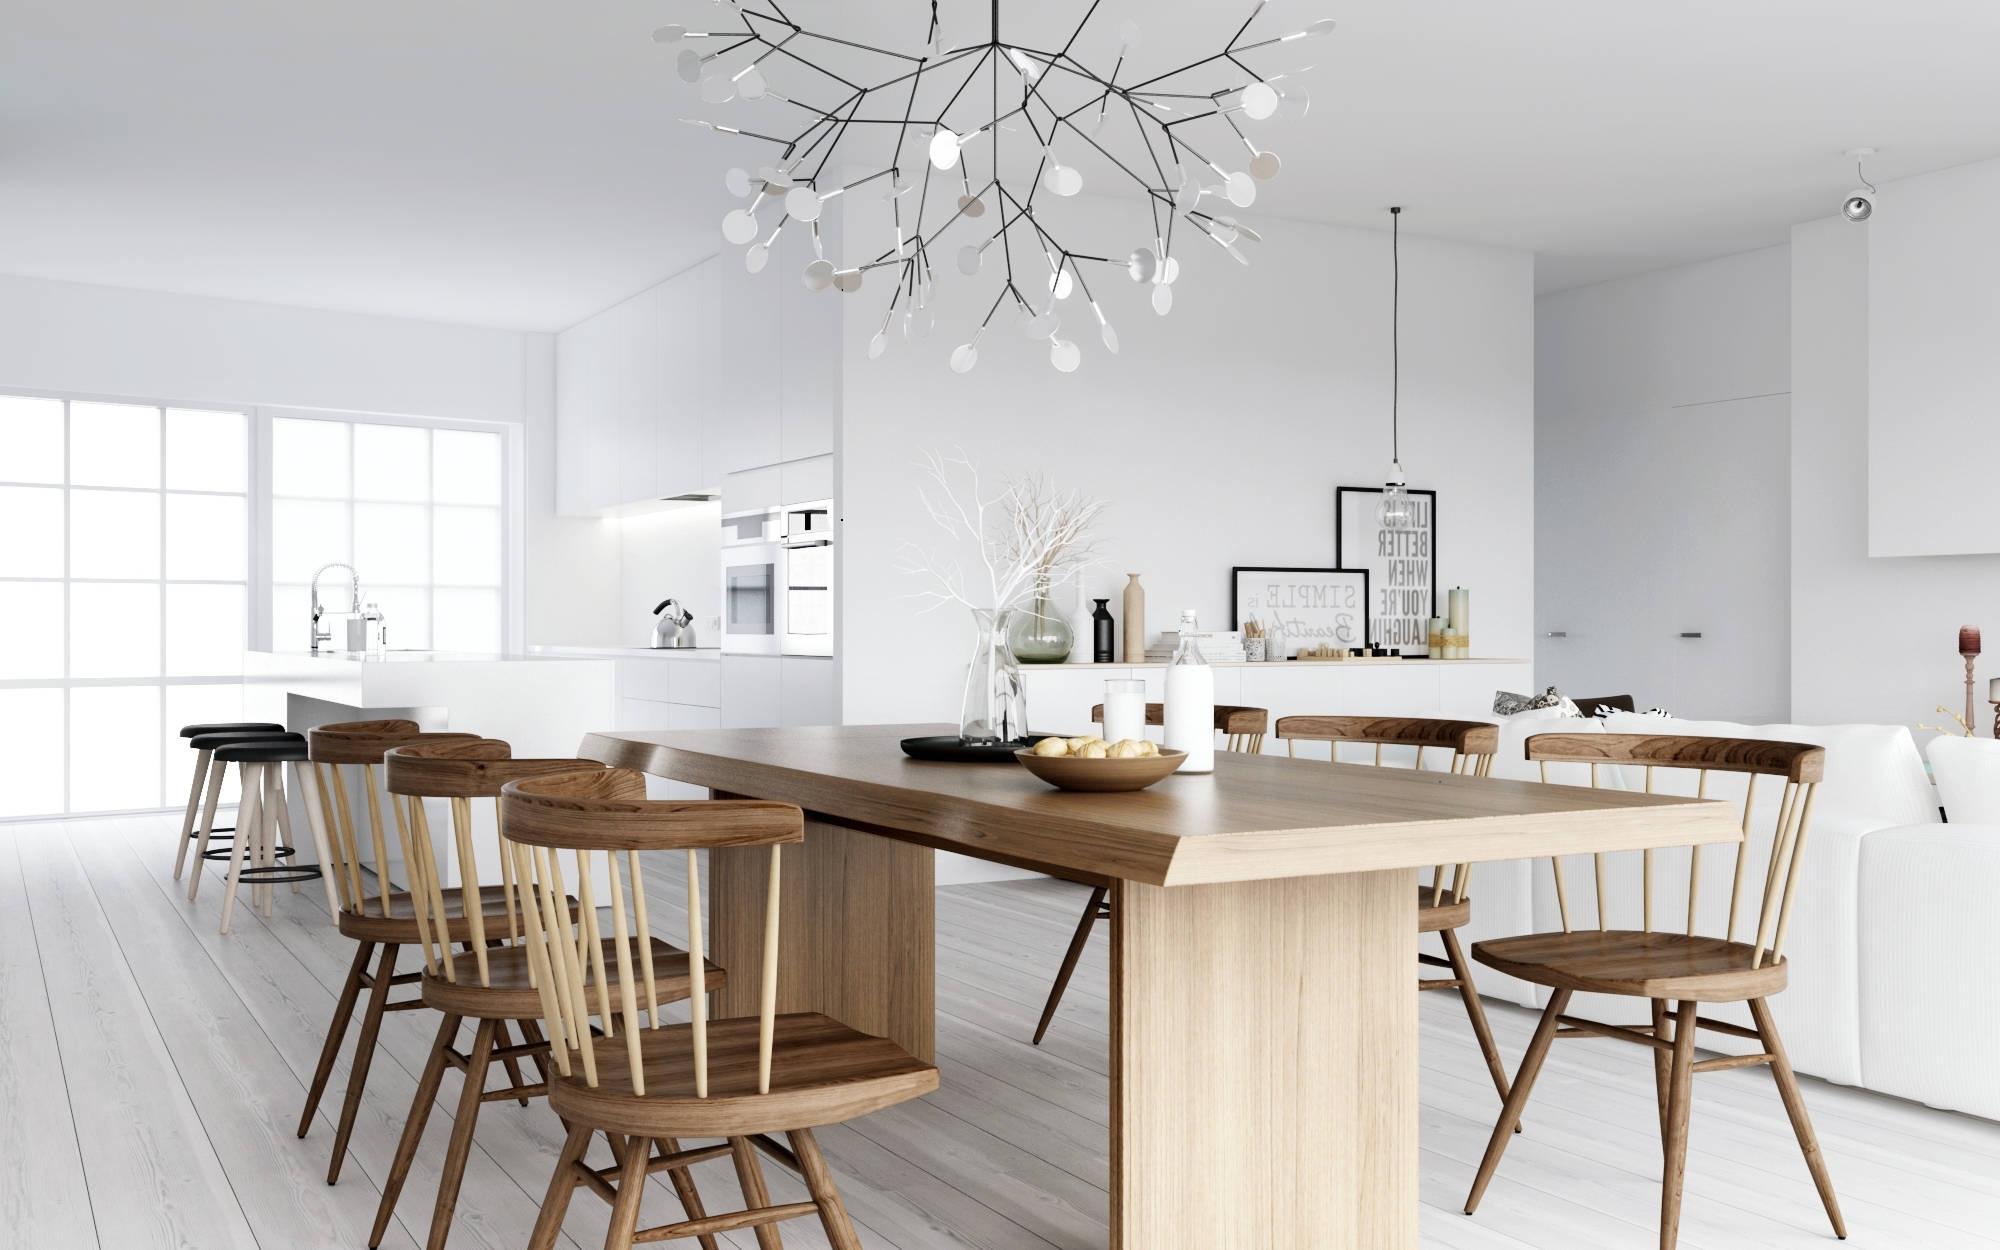 Scandinavian Chandeliers For Most Recent Luxury Tech Lighting Chandeliers Atdesign Wooden Dining Nordic Style (View 6 of 20)